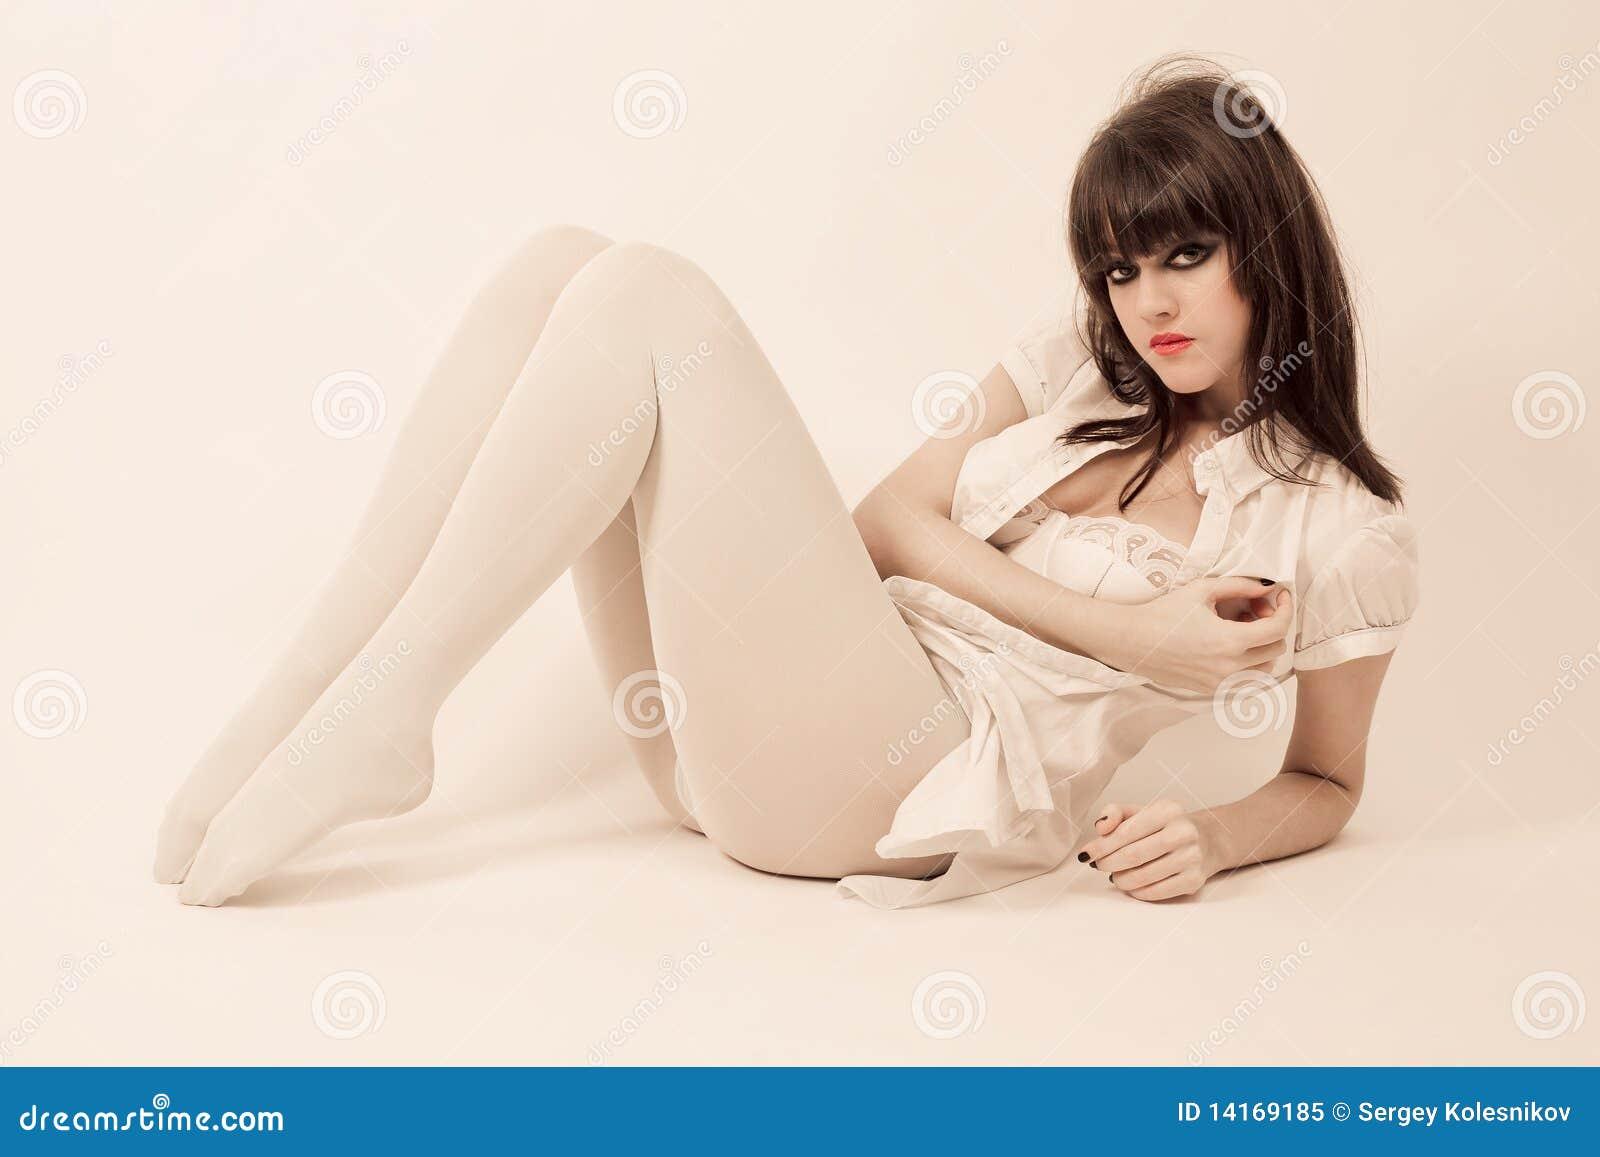 Putting a dick i womens butt